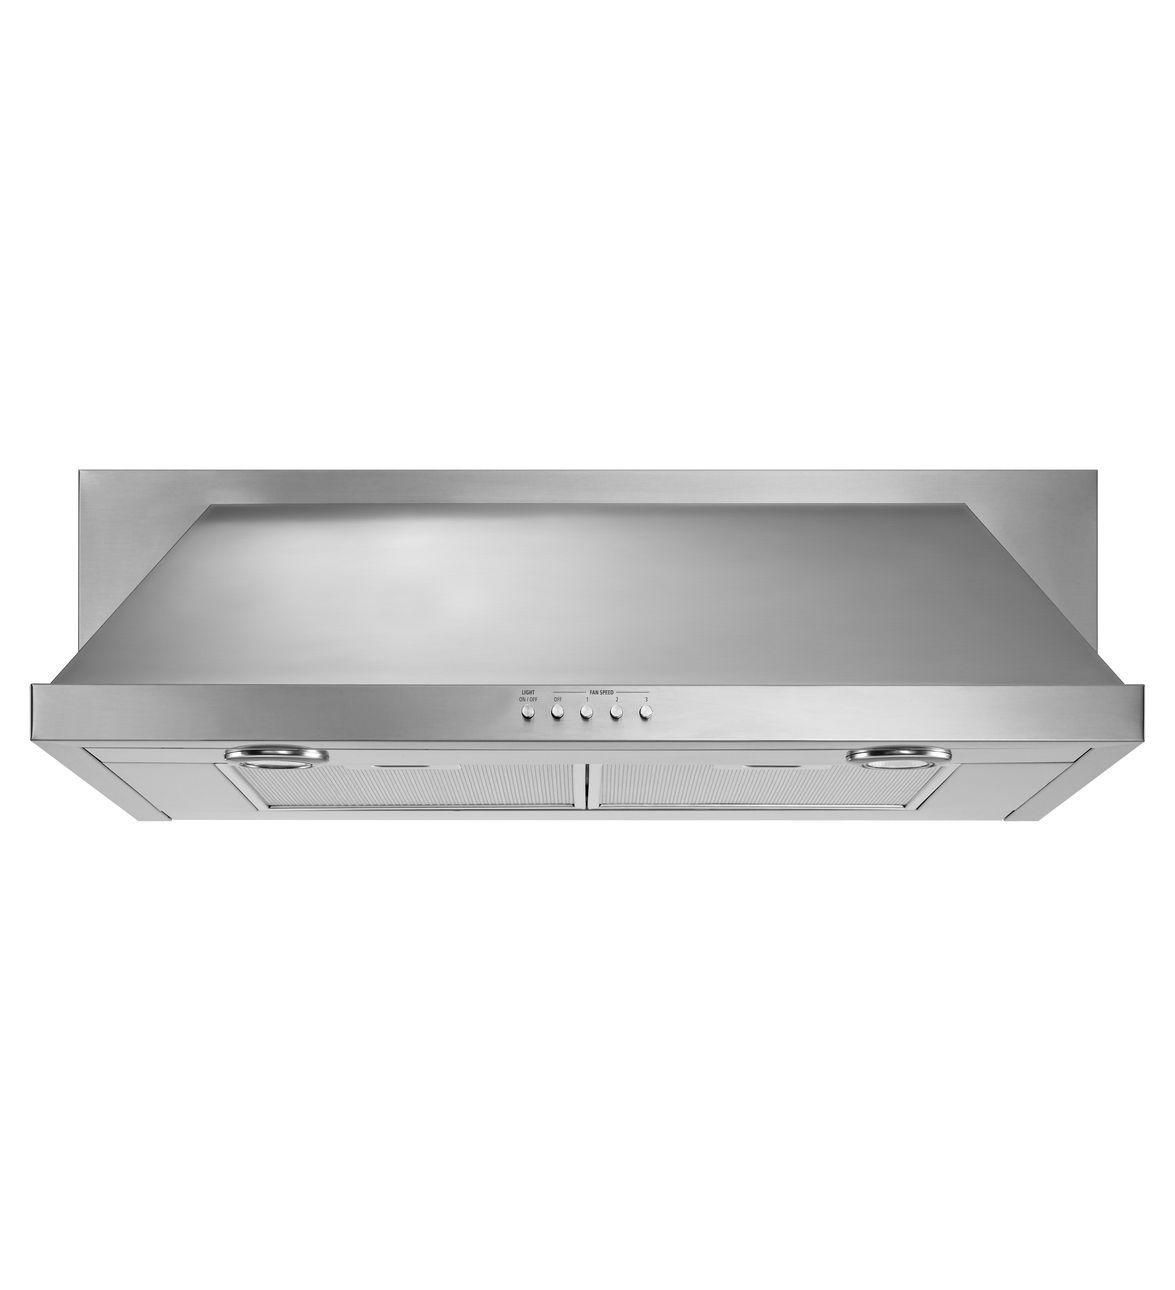 30 Under Cabinet Range Hood Nxr Rh3001 Professional 30 Under Cabinet All Stainless Steel